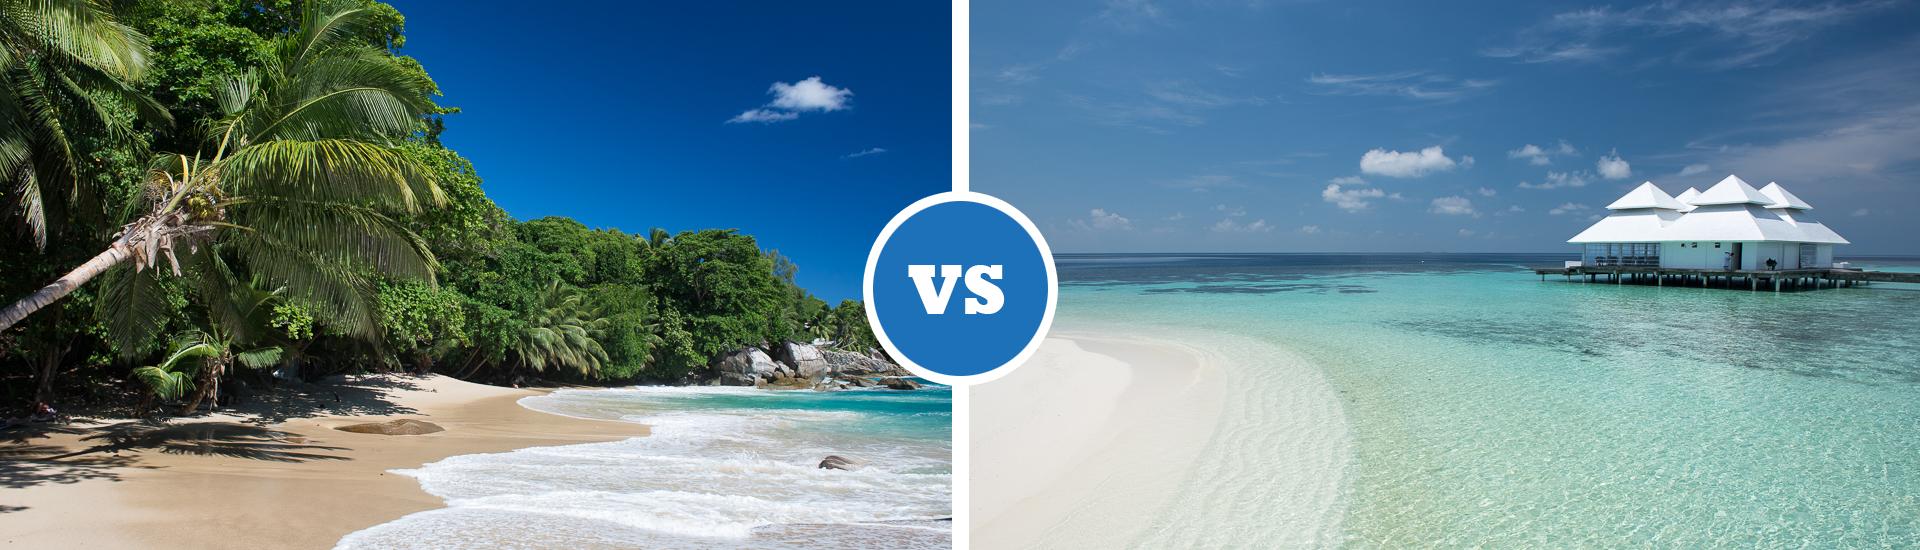 Seychellen Malediven Karte.Ab Ins Paradies Seychellen Oder Malediven Reiseblog Travelography